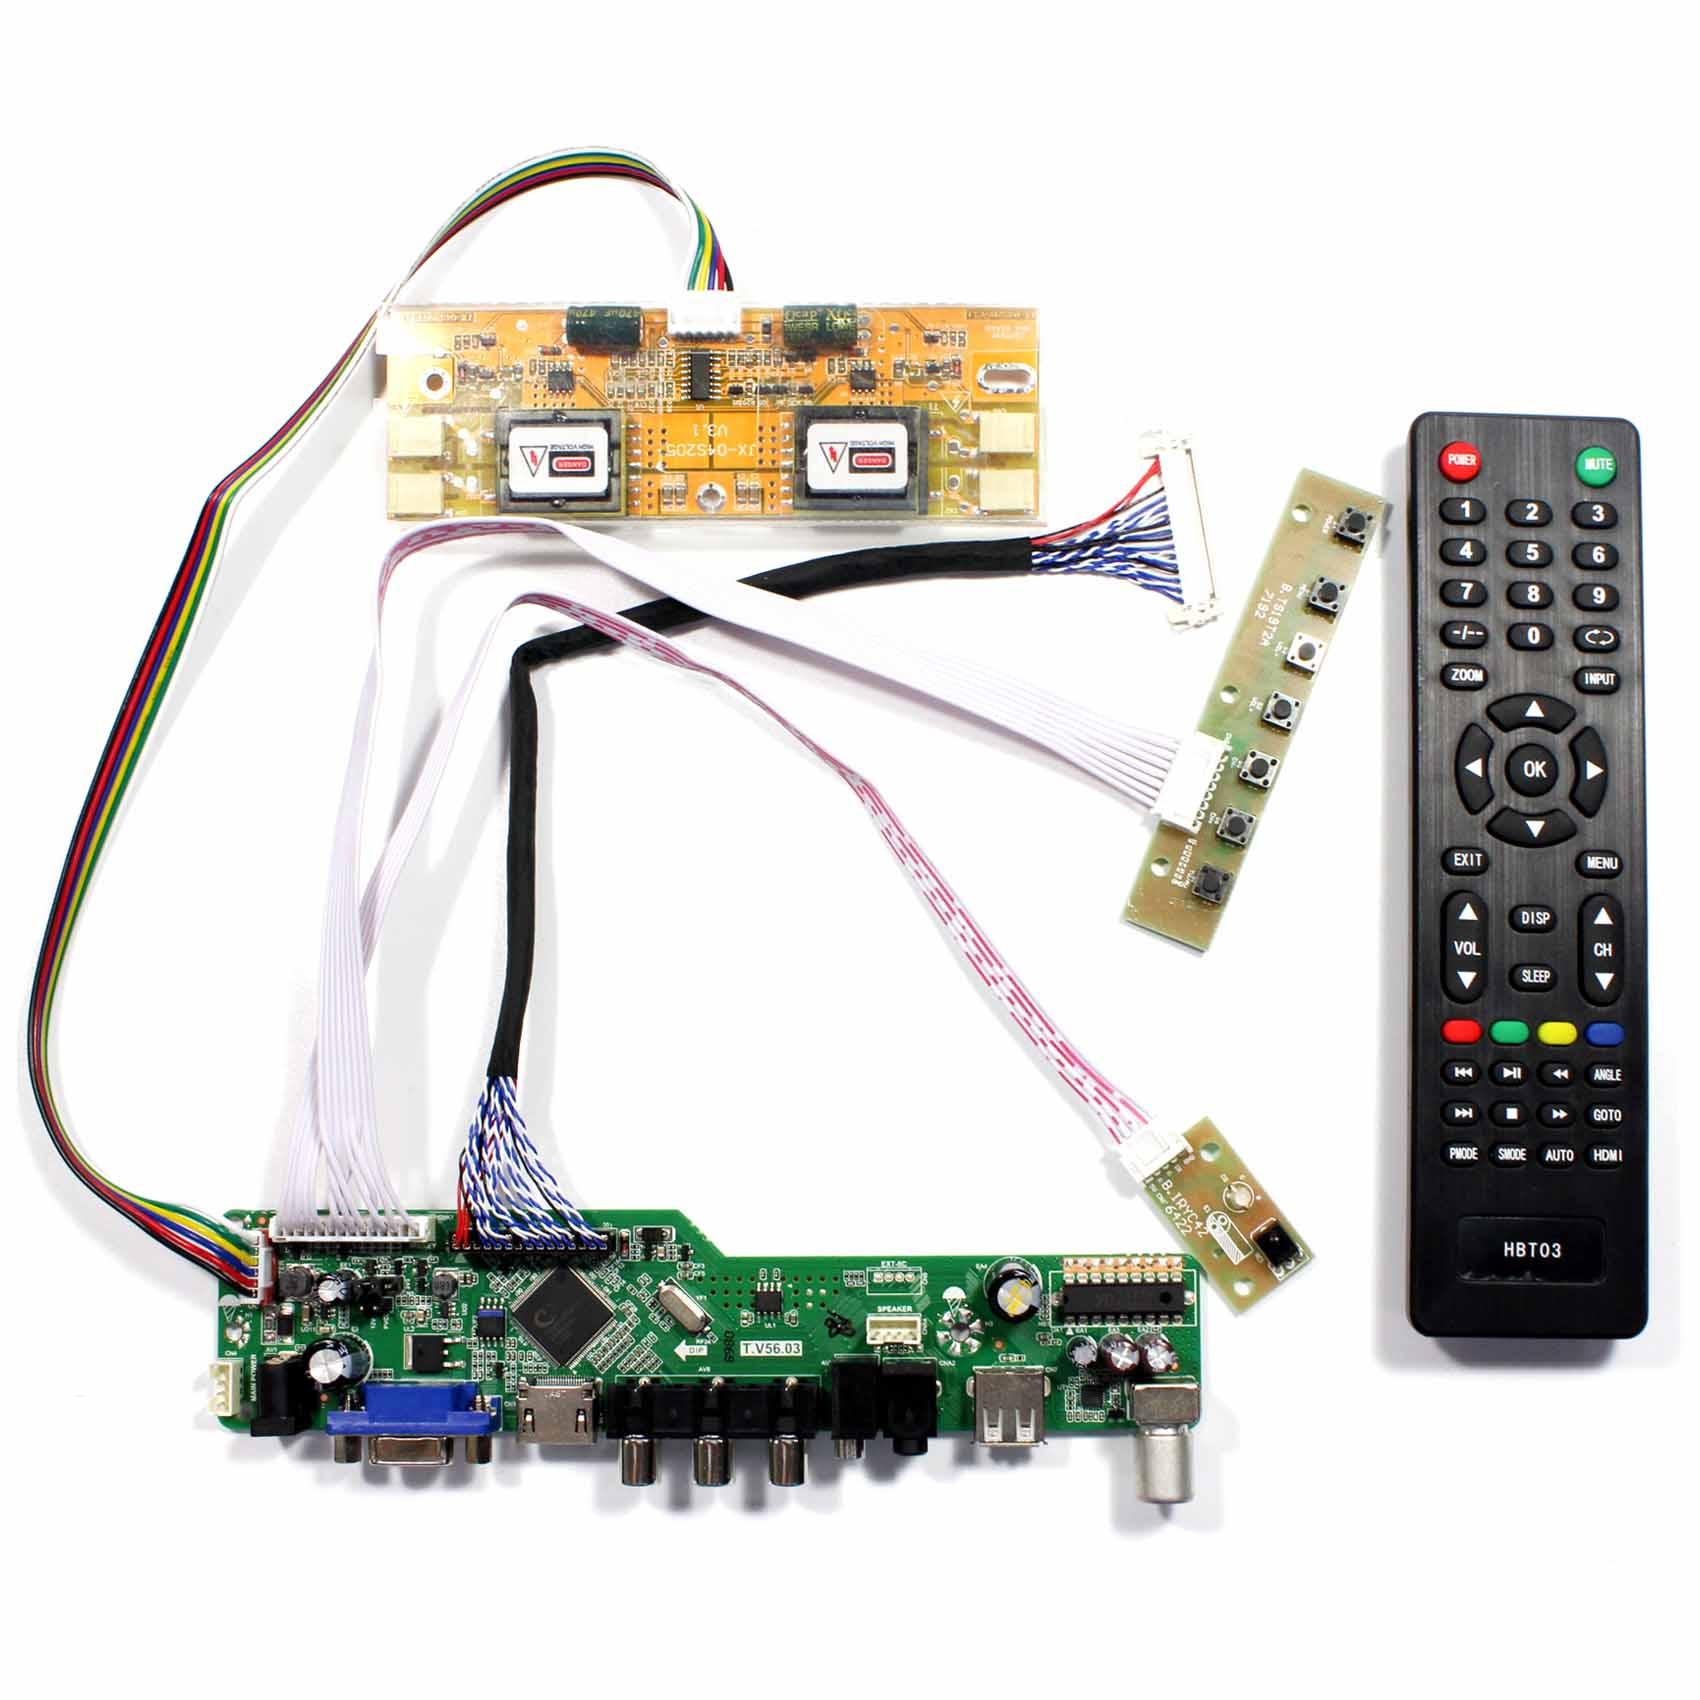 TV HDMI VGA AV USB AUDIO LCD Controller Board For 20 1 22 M201EW02 V1 M201EW02